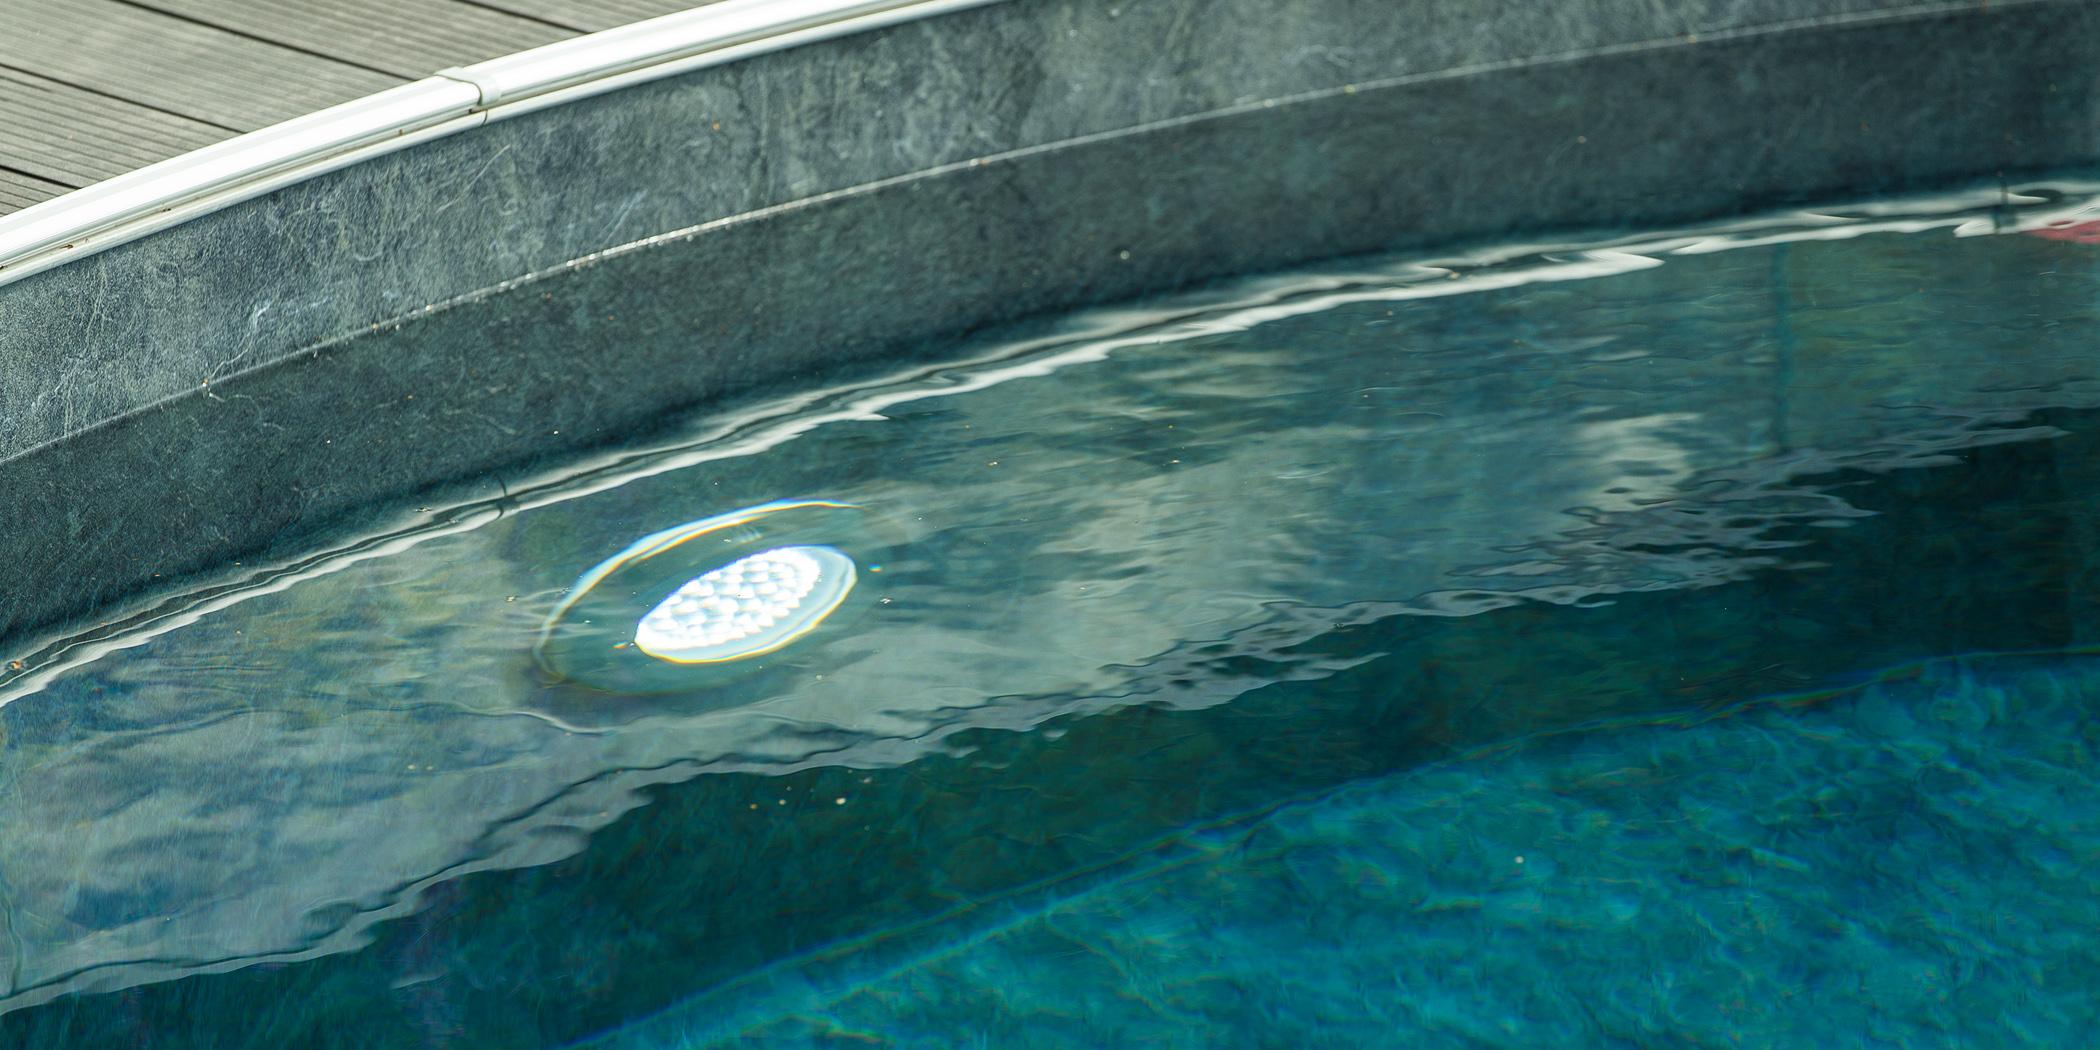 Metāla karkasa baseins. SPA servisa centrs